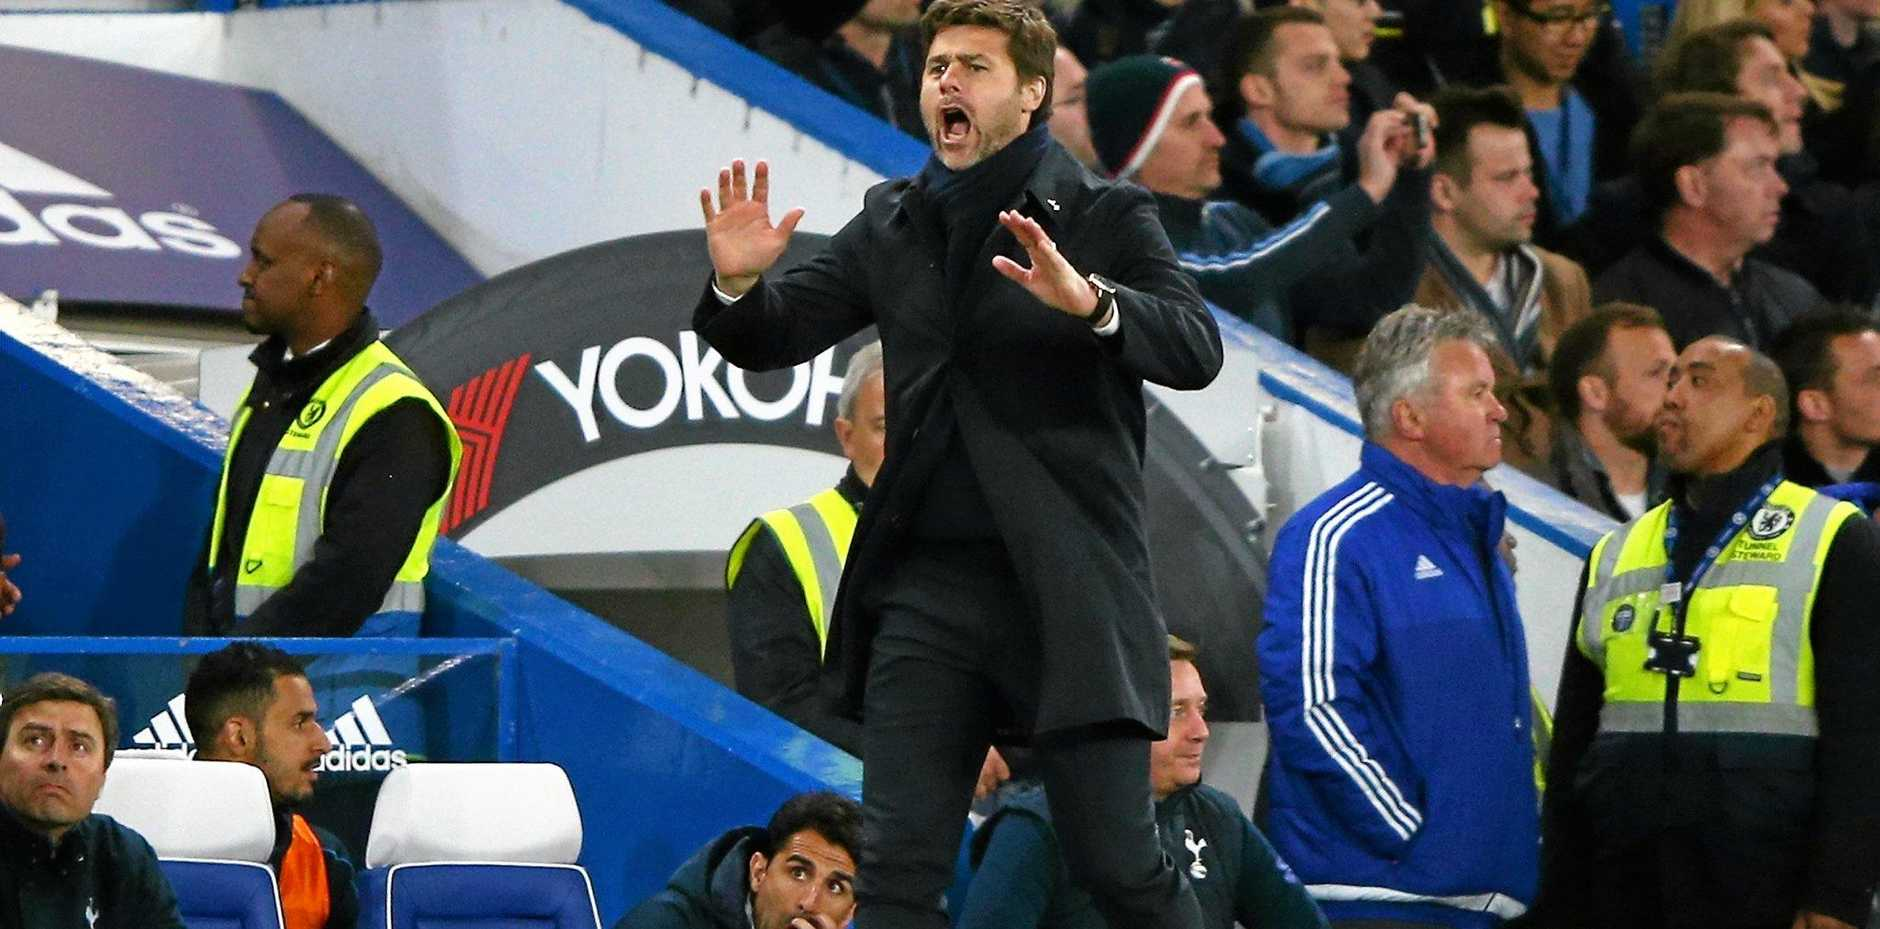 Tottenham manager Mauricio Pochettino urges his team on against Chelsea